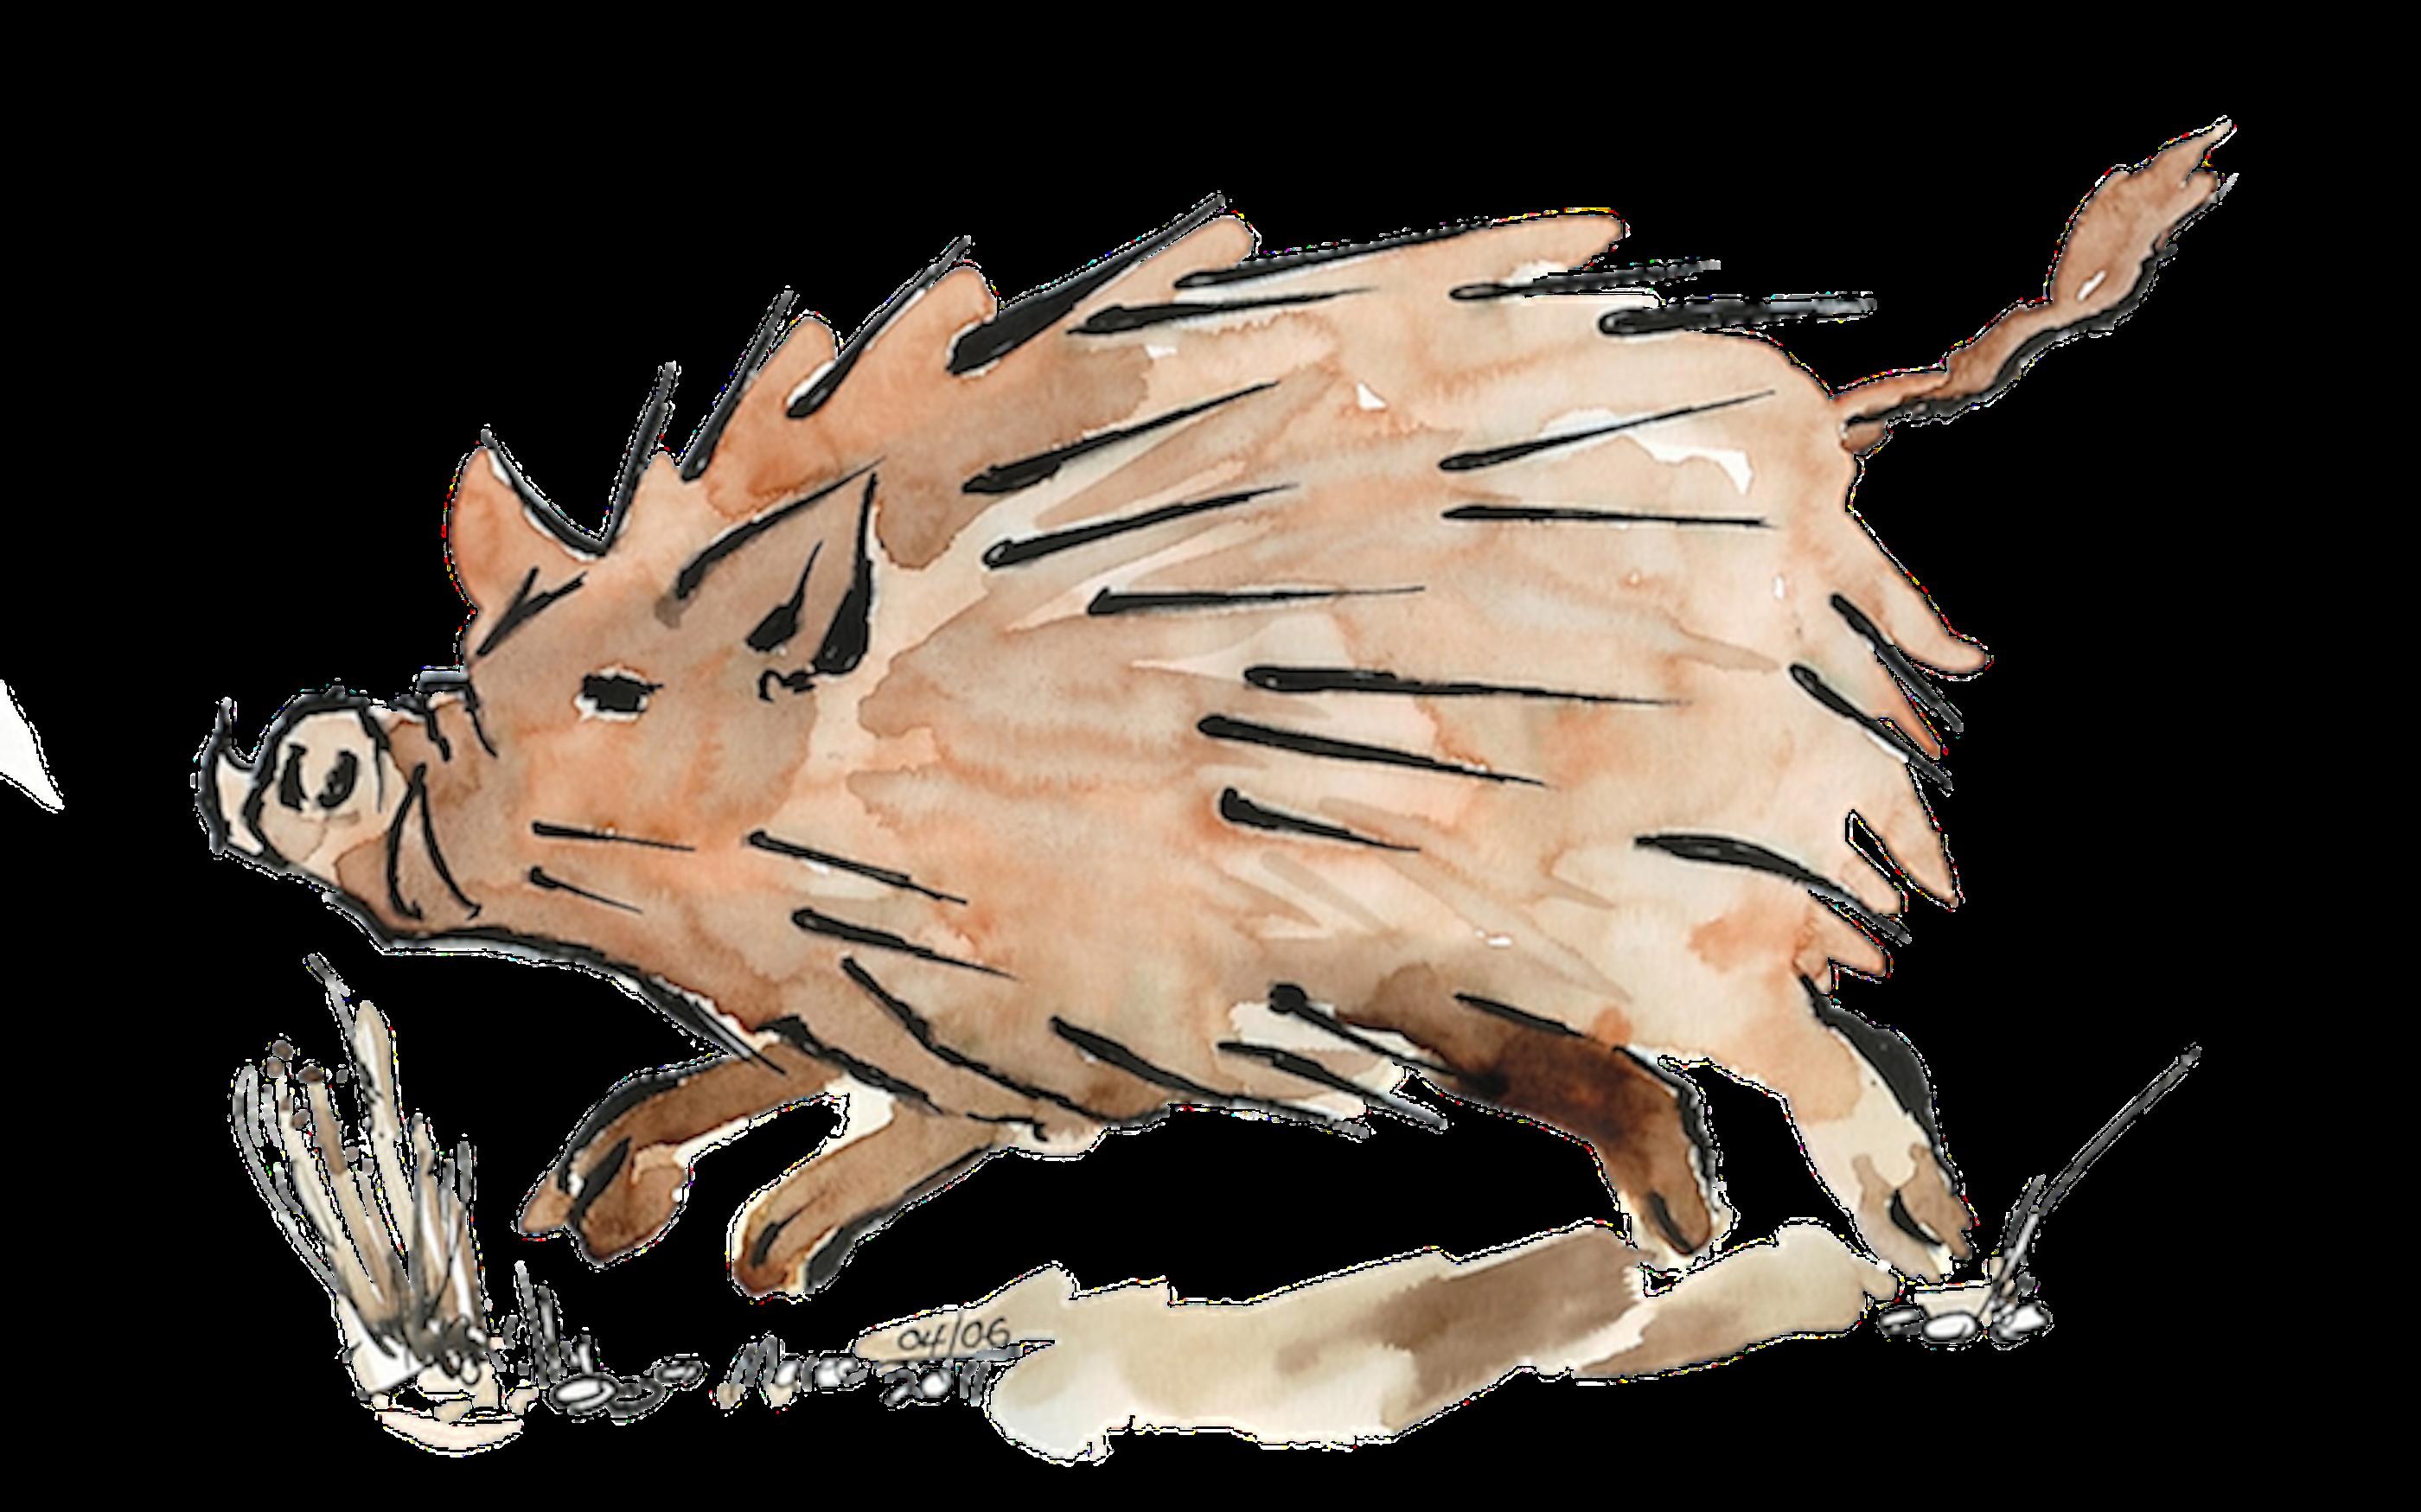 Warthog sketch in Moleskine Folio 200gsm